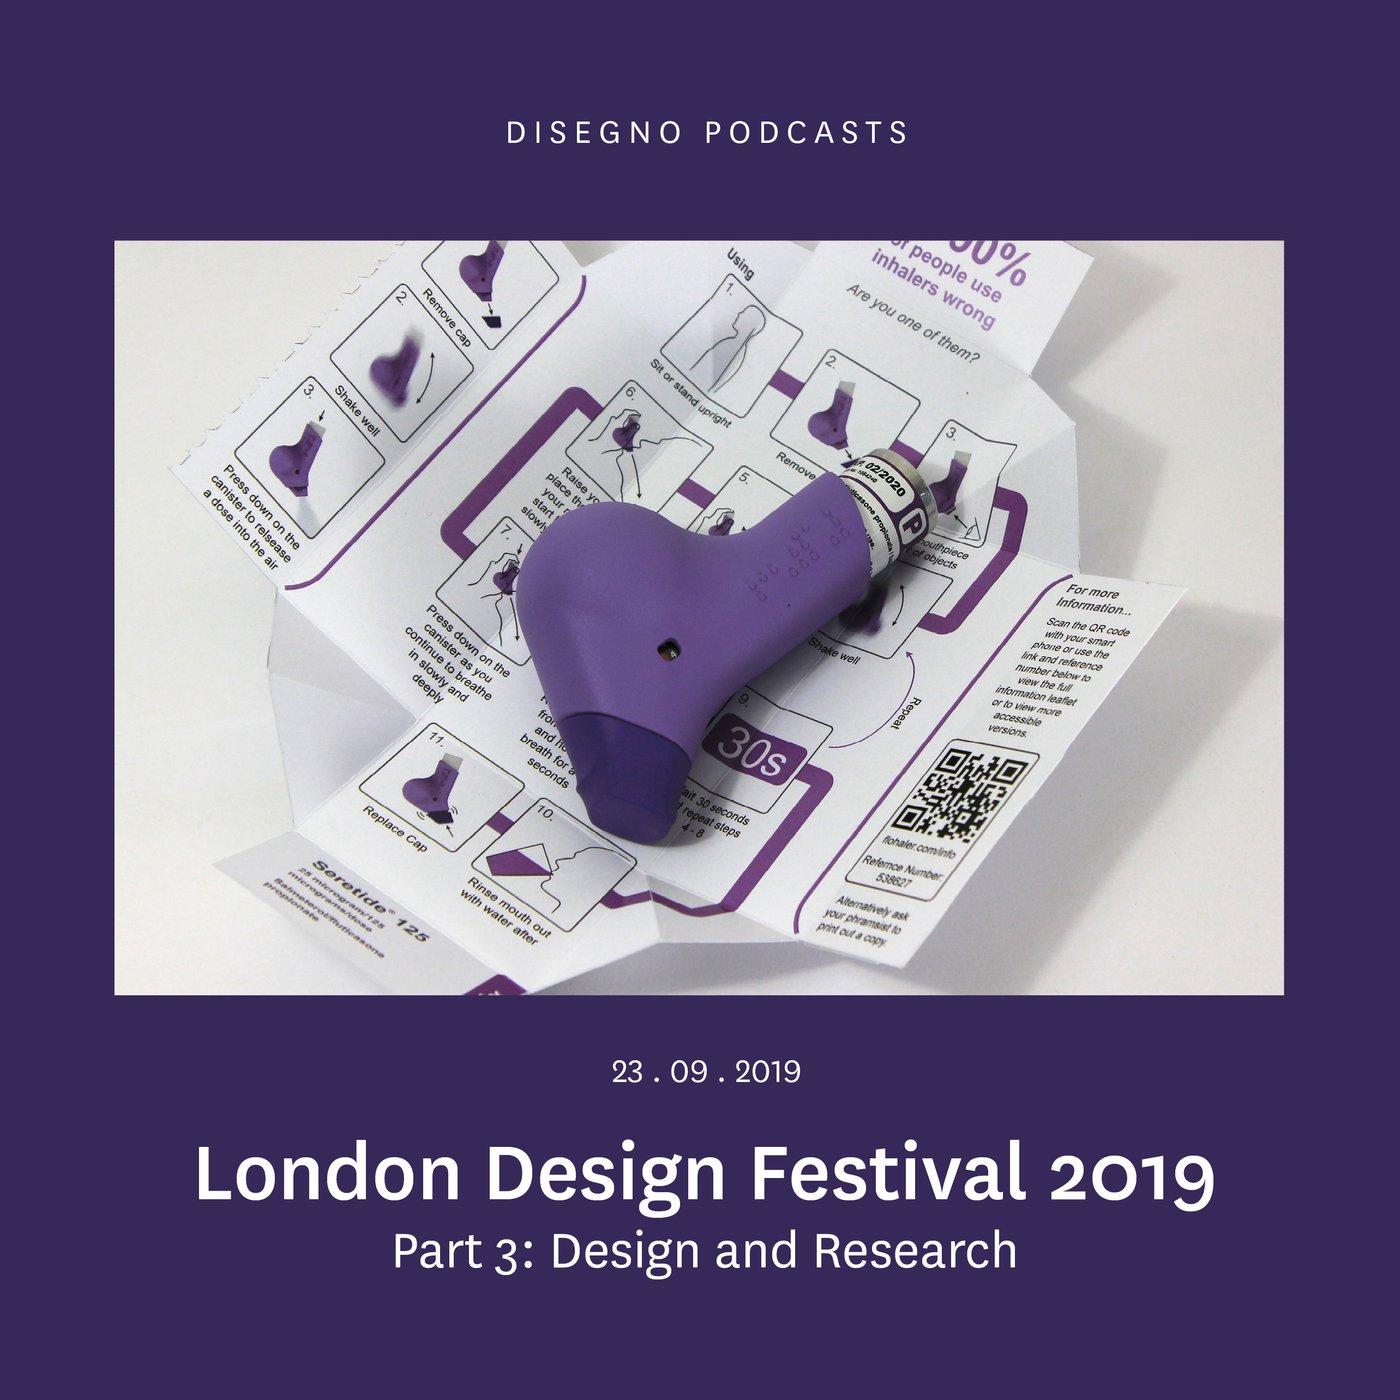 London Design Festival 2019: Design and Research